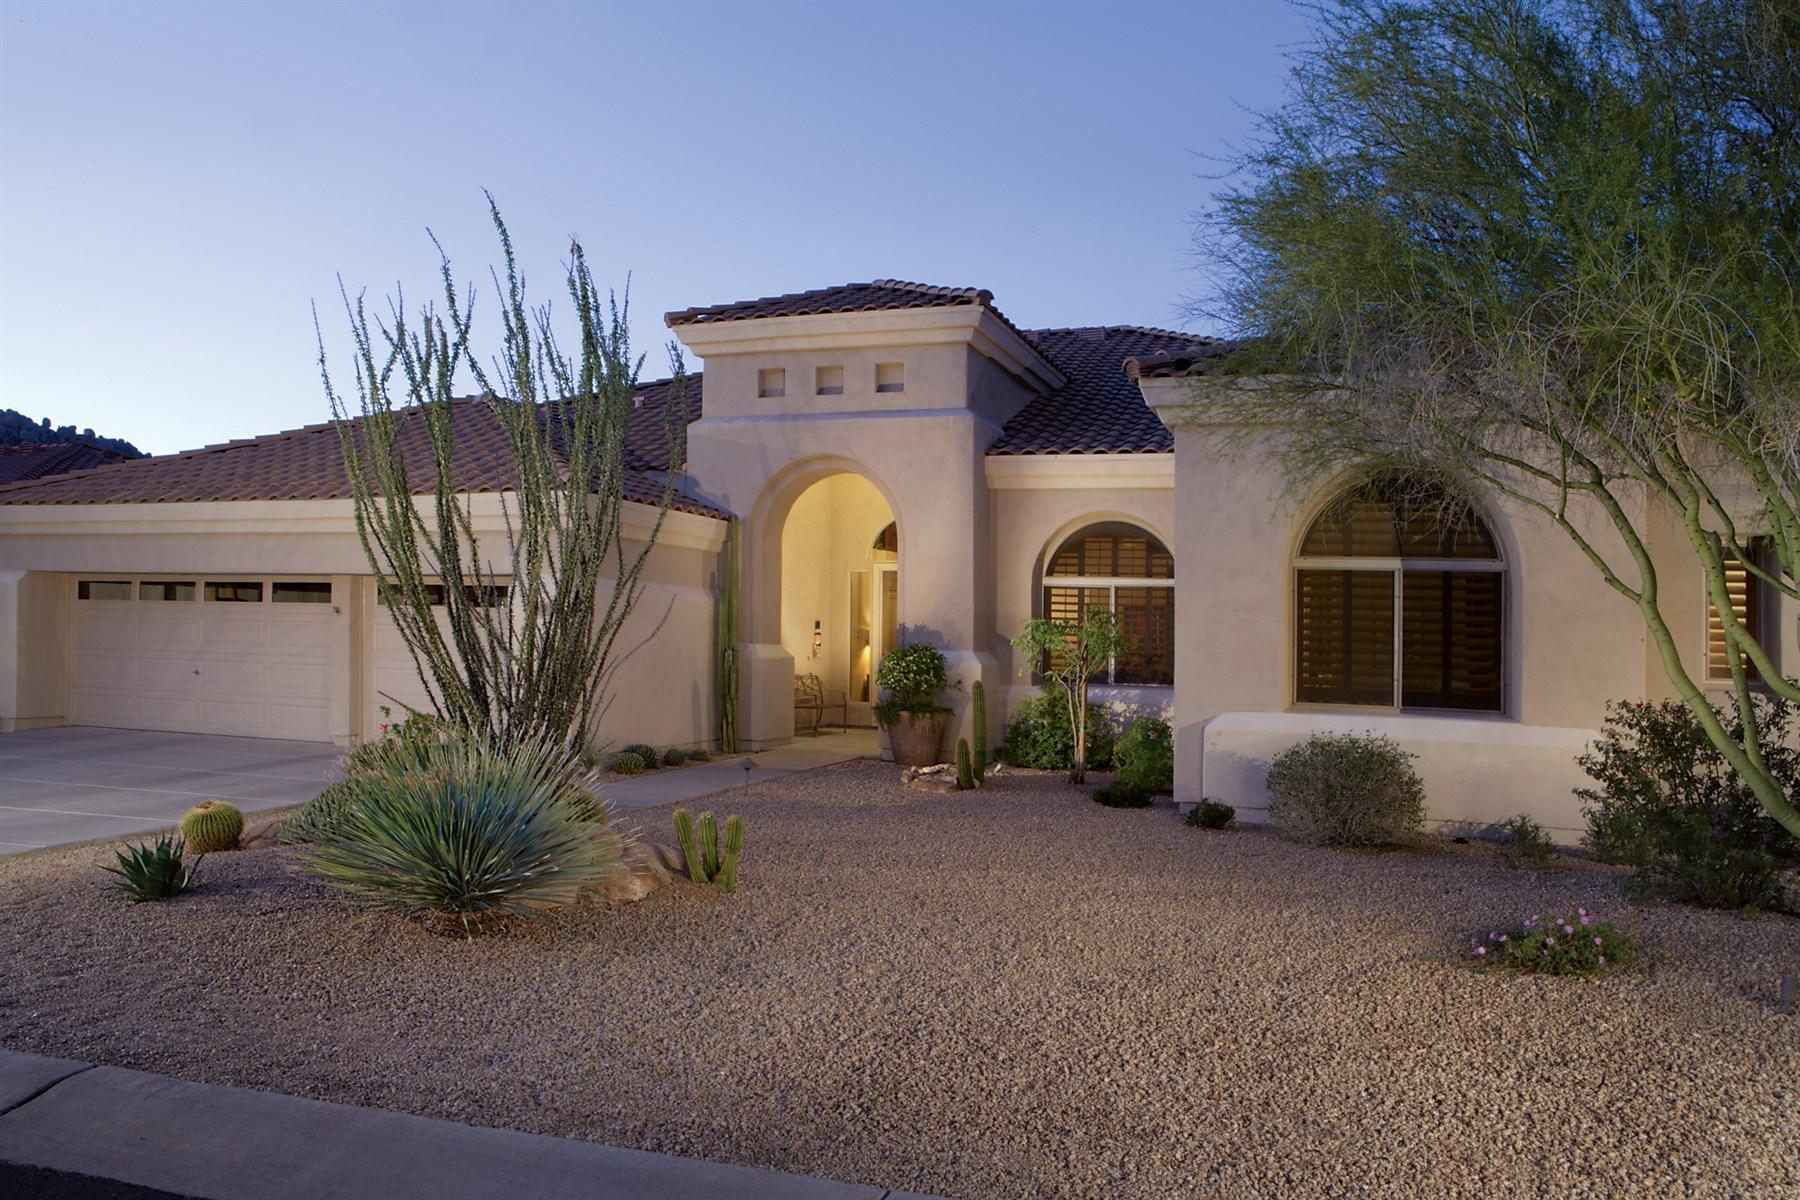 Casa para uma família para Venda às Wonderful Cul-De-Sac Location In North Scottsdale's Troon Village 11934 E Sand Hills Road Scottsdale, Arizona 85255 Estados Unidos